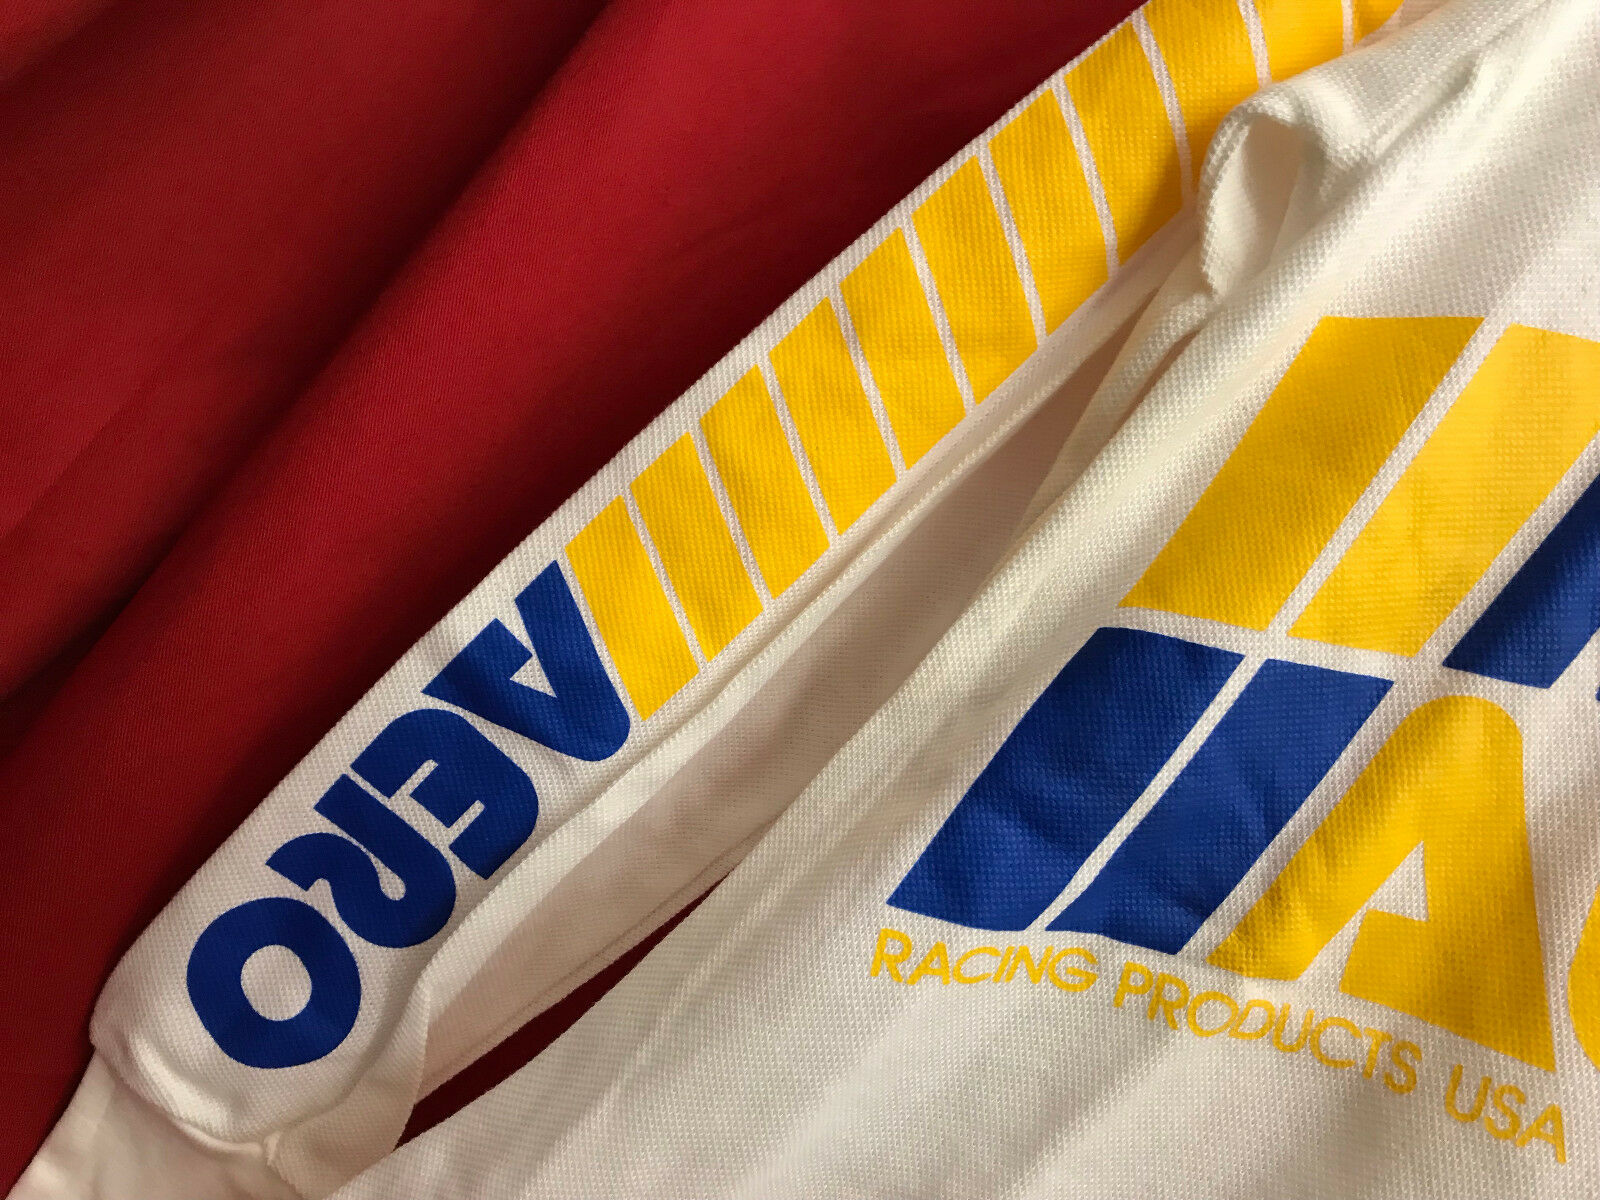 100% NOS BMX oldschool AERO factory S/EU176cm/38in/96cm race shirt S/EU176cm/38in/96cm factory longsleeve 2ffb48